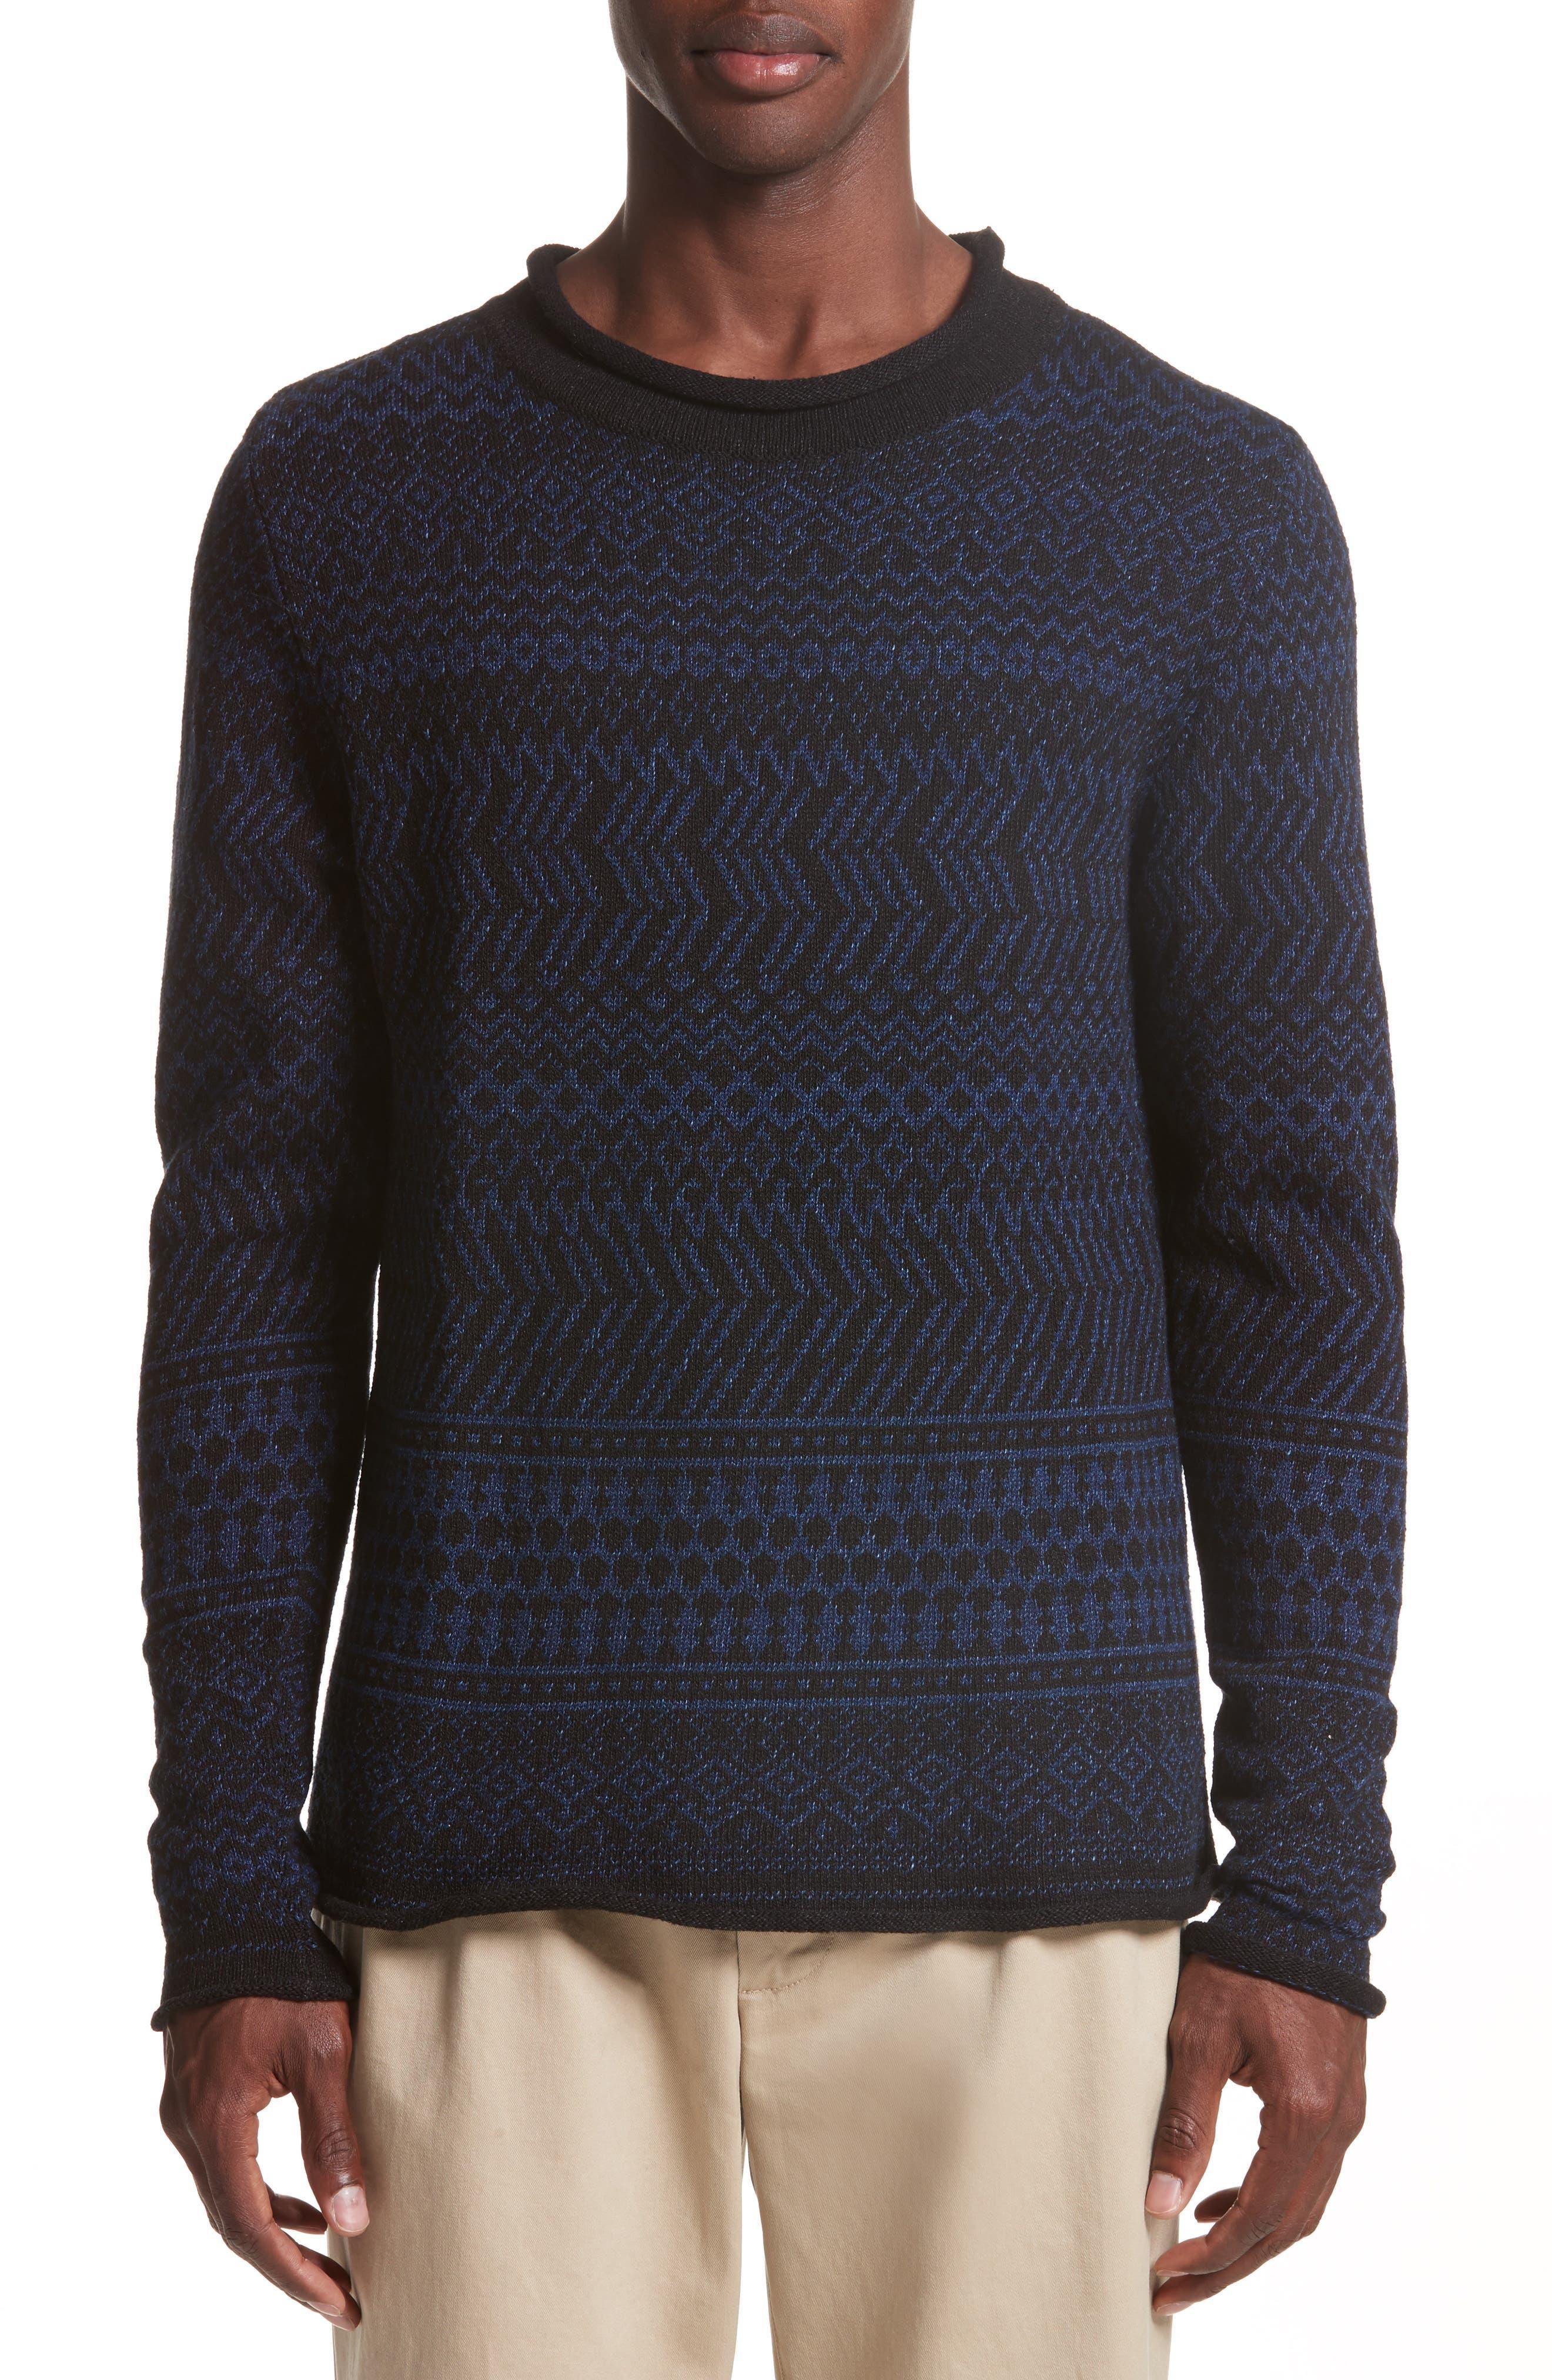 Alternate Image 1 Selected - Eidos Napoli Fair Isle Roll Neck Sweater